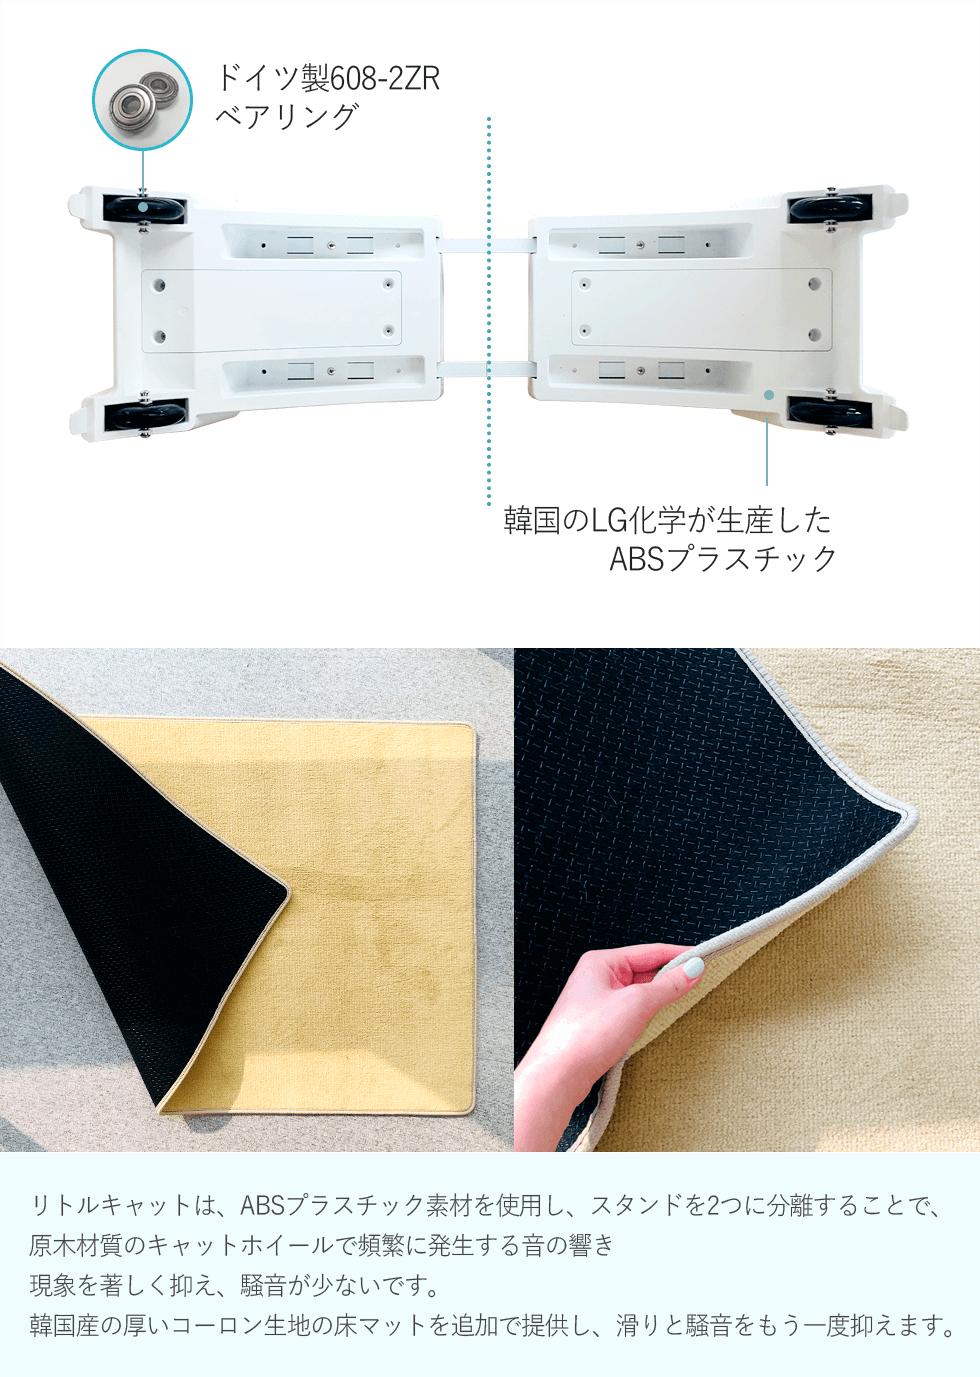 japan_detail_06-1_01.png